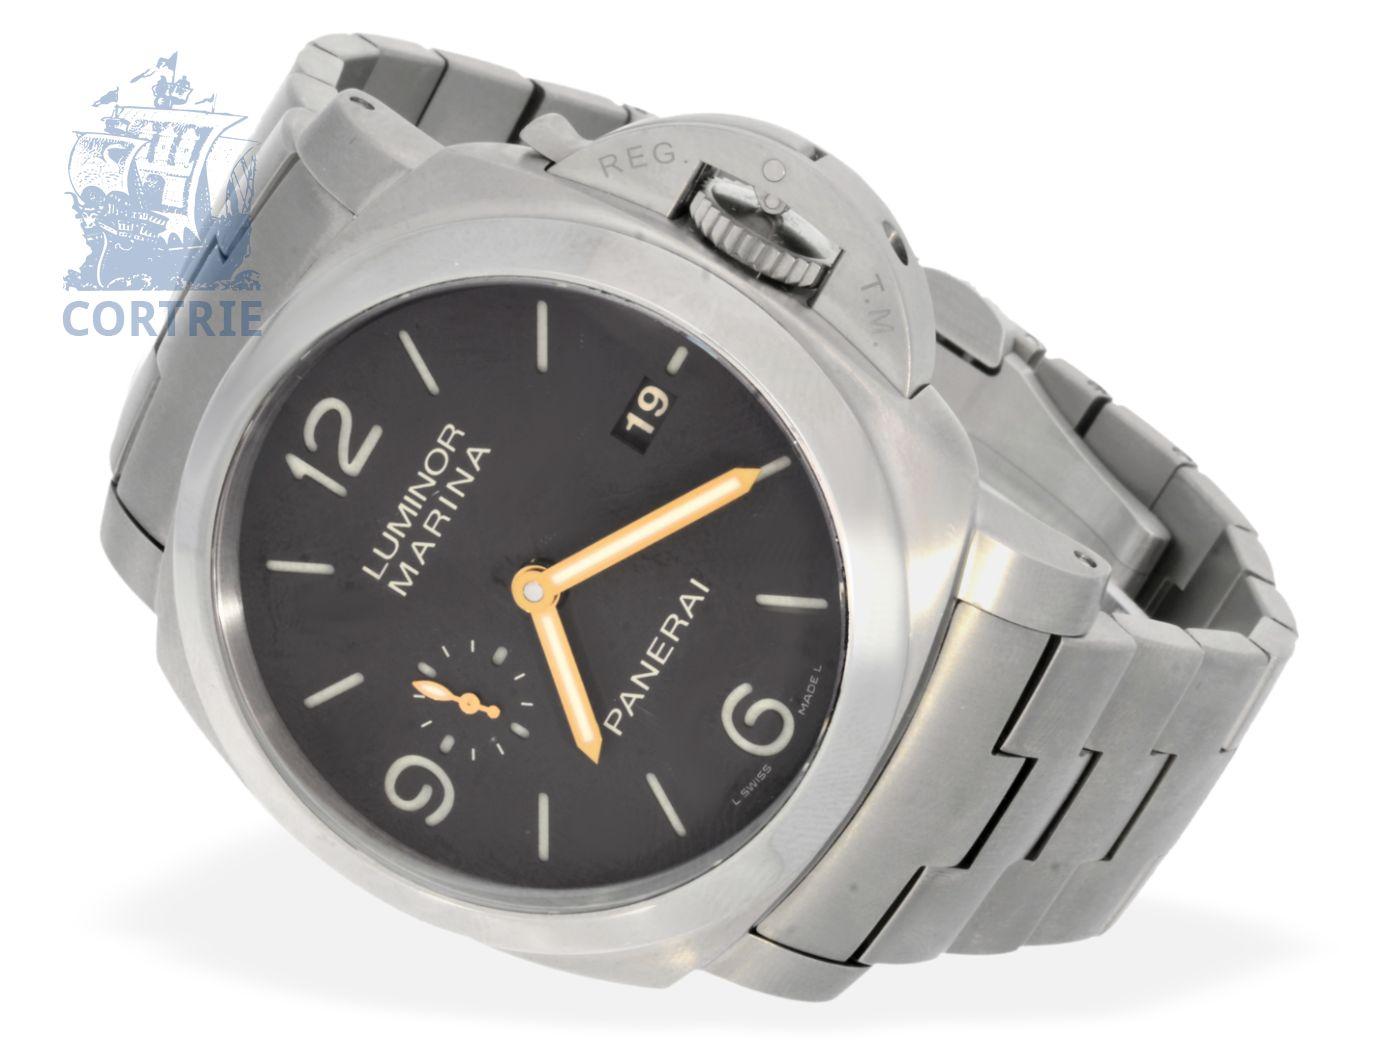 Wristwatch: very rare titanium Panerai Luminor Marina with black dial, limited to 500 pieces, ca. 2008-